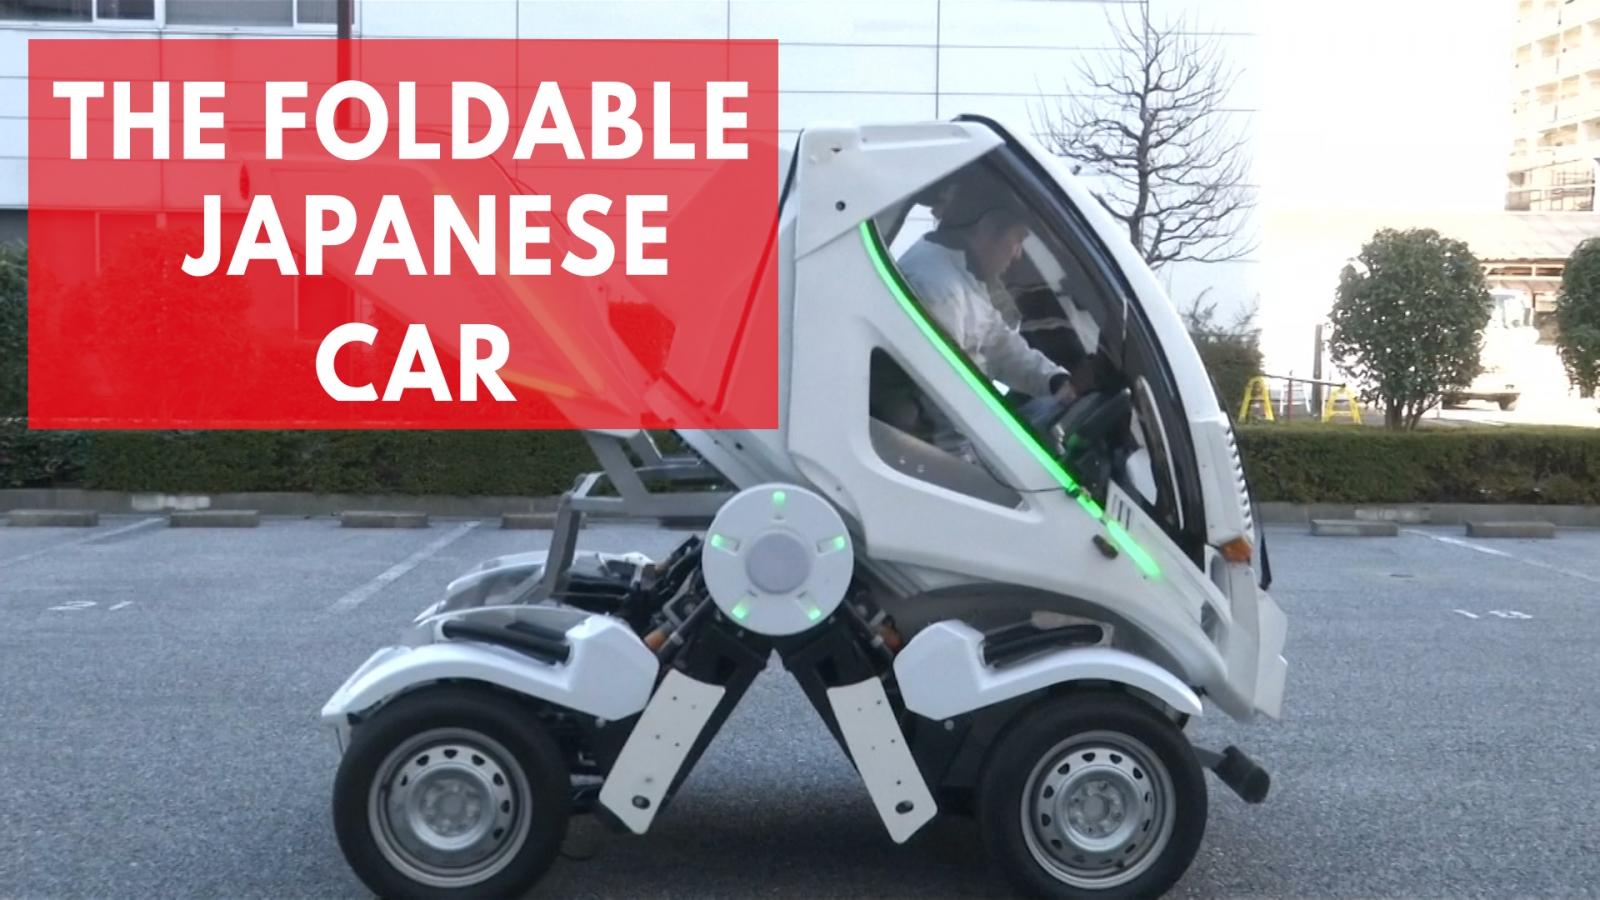 The Foldable Japanese Car: 'Earth-1'